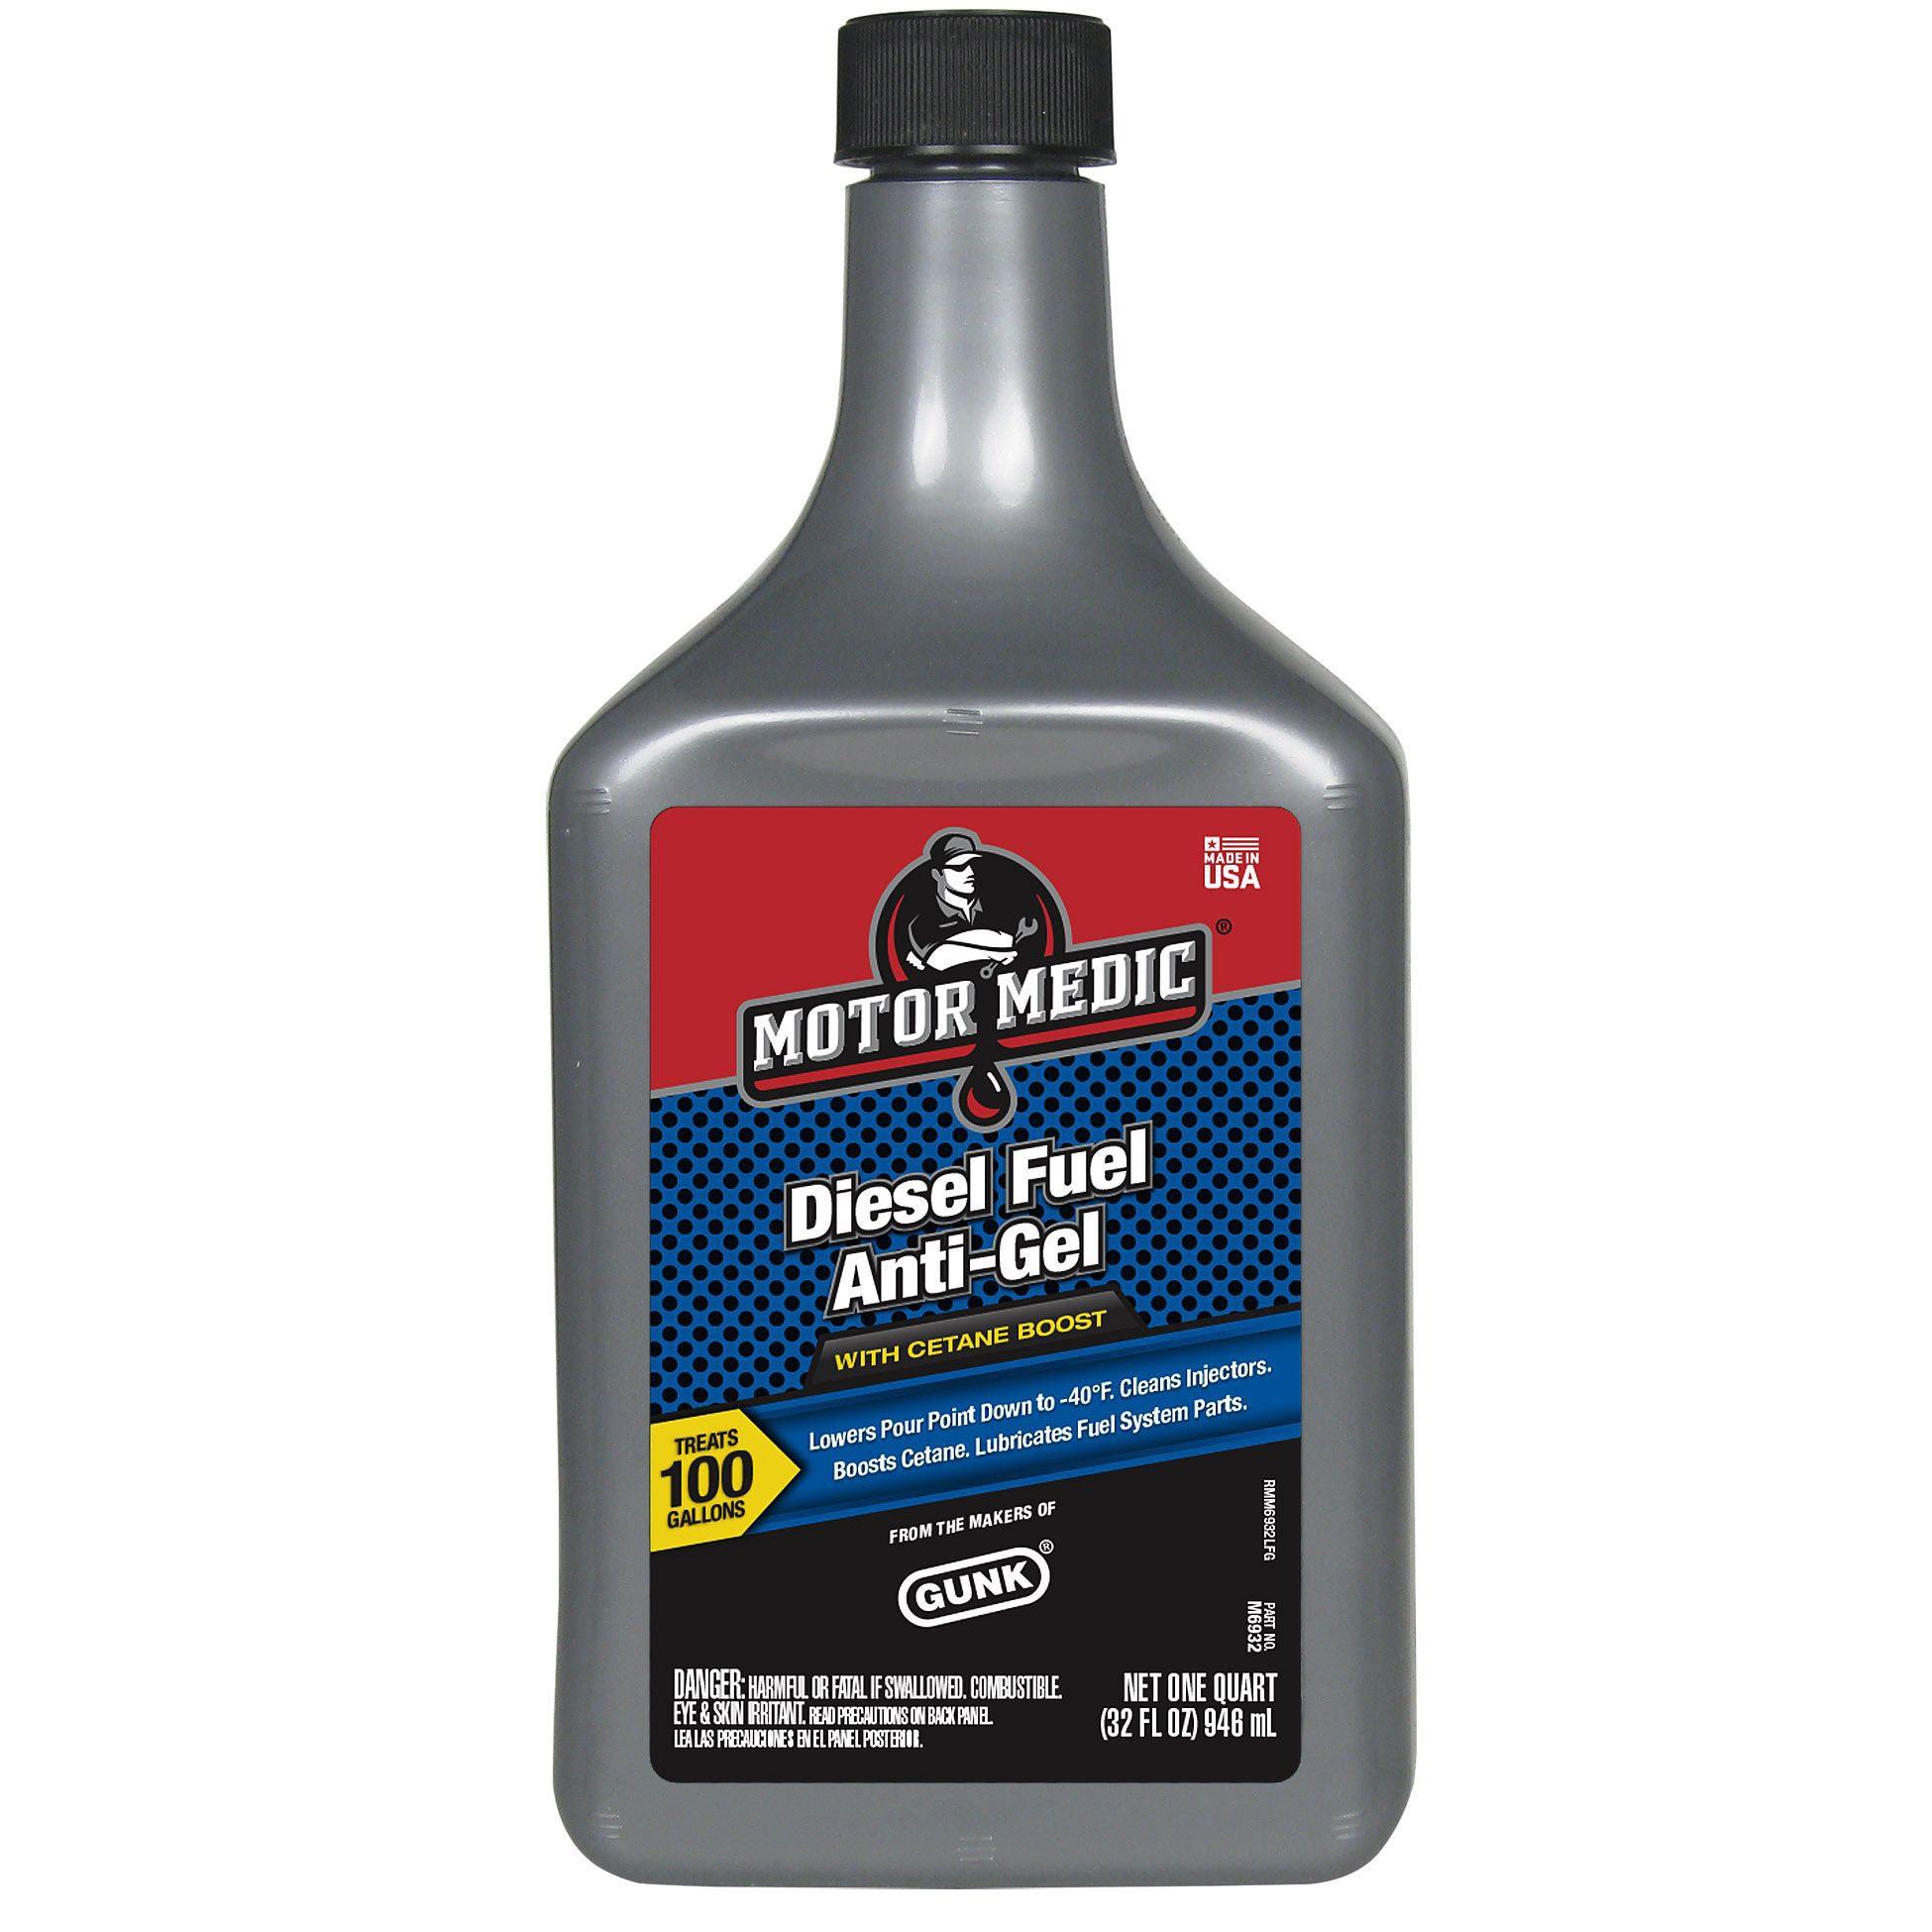 Gunk M6932 32 Oz Diesel Fuel Anti-Gel (Car care/cleaning)